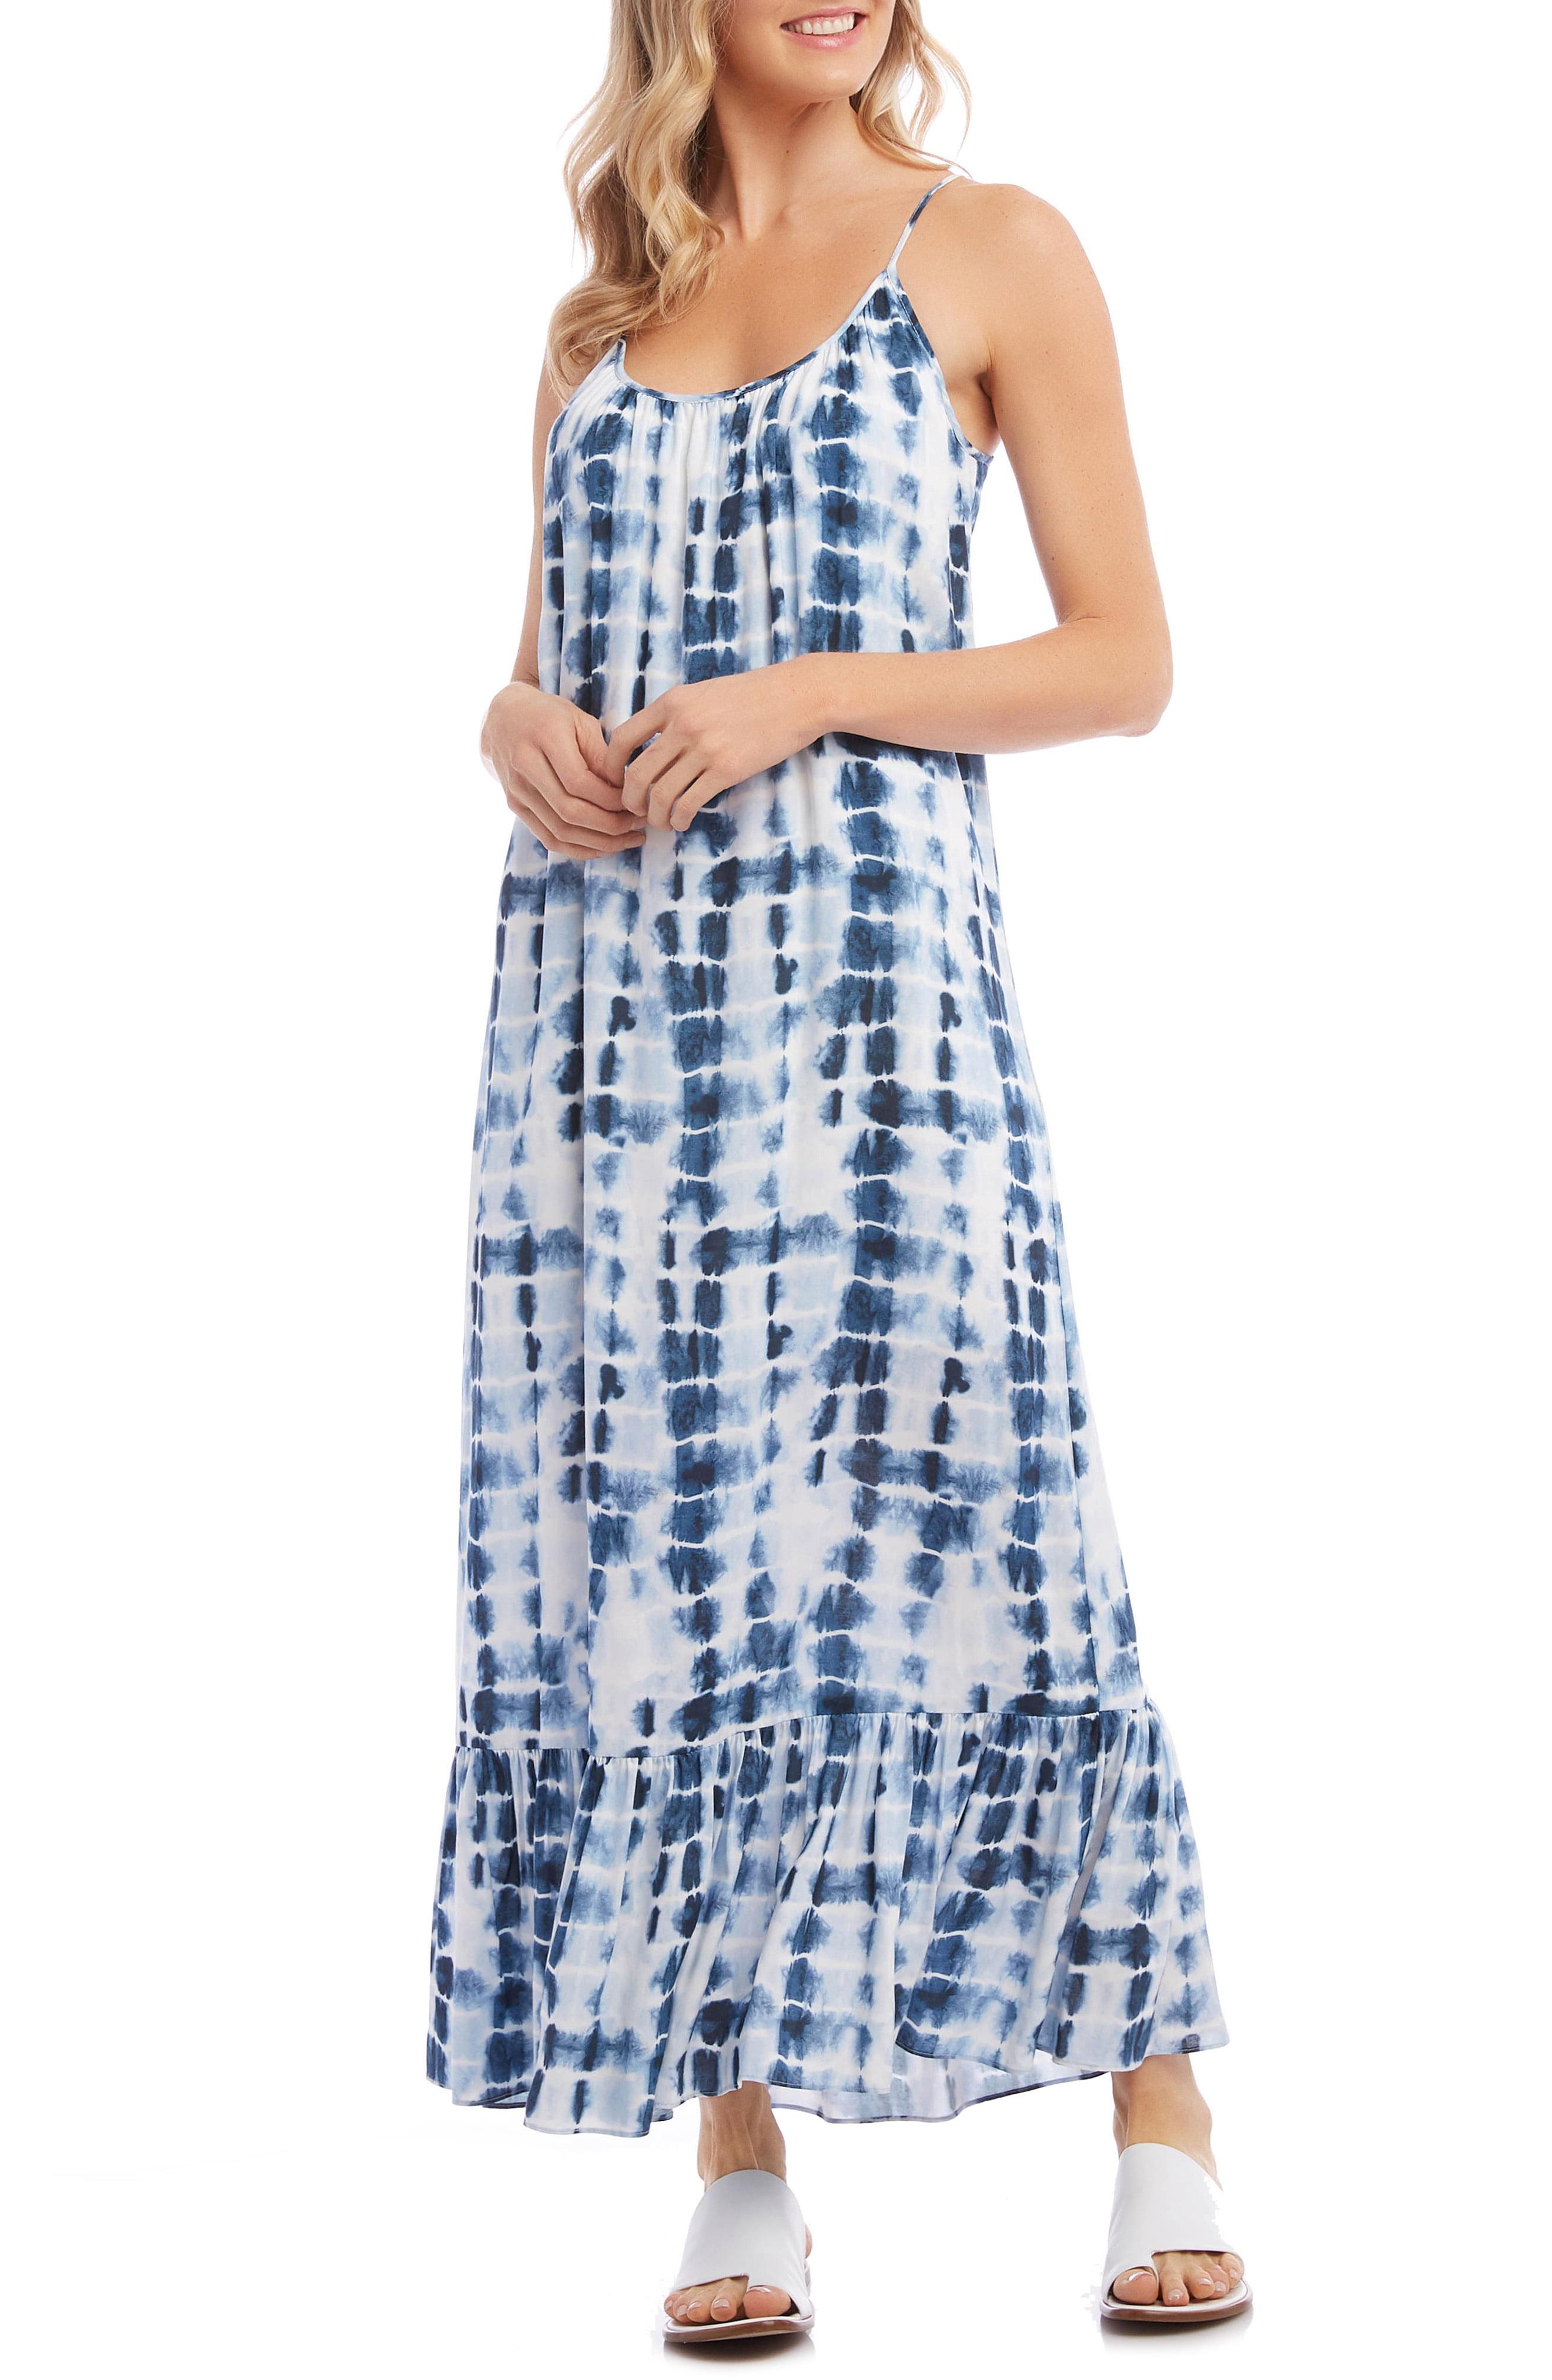 Women S Karen Kane Ruffle Hem Maxi Dress Size Small Blue Tie Dye Maxi Dresses Maxi Dress Fashion Clothes Women [ 4048 x 2640 Pixel ]